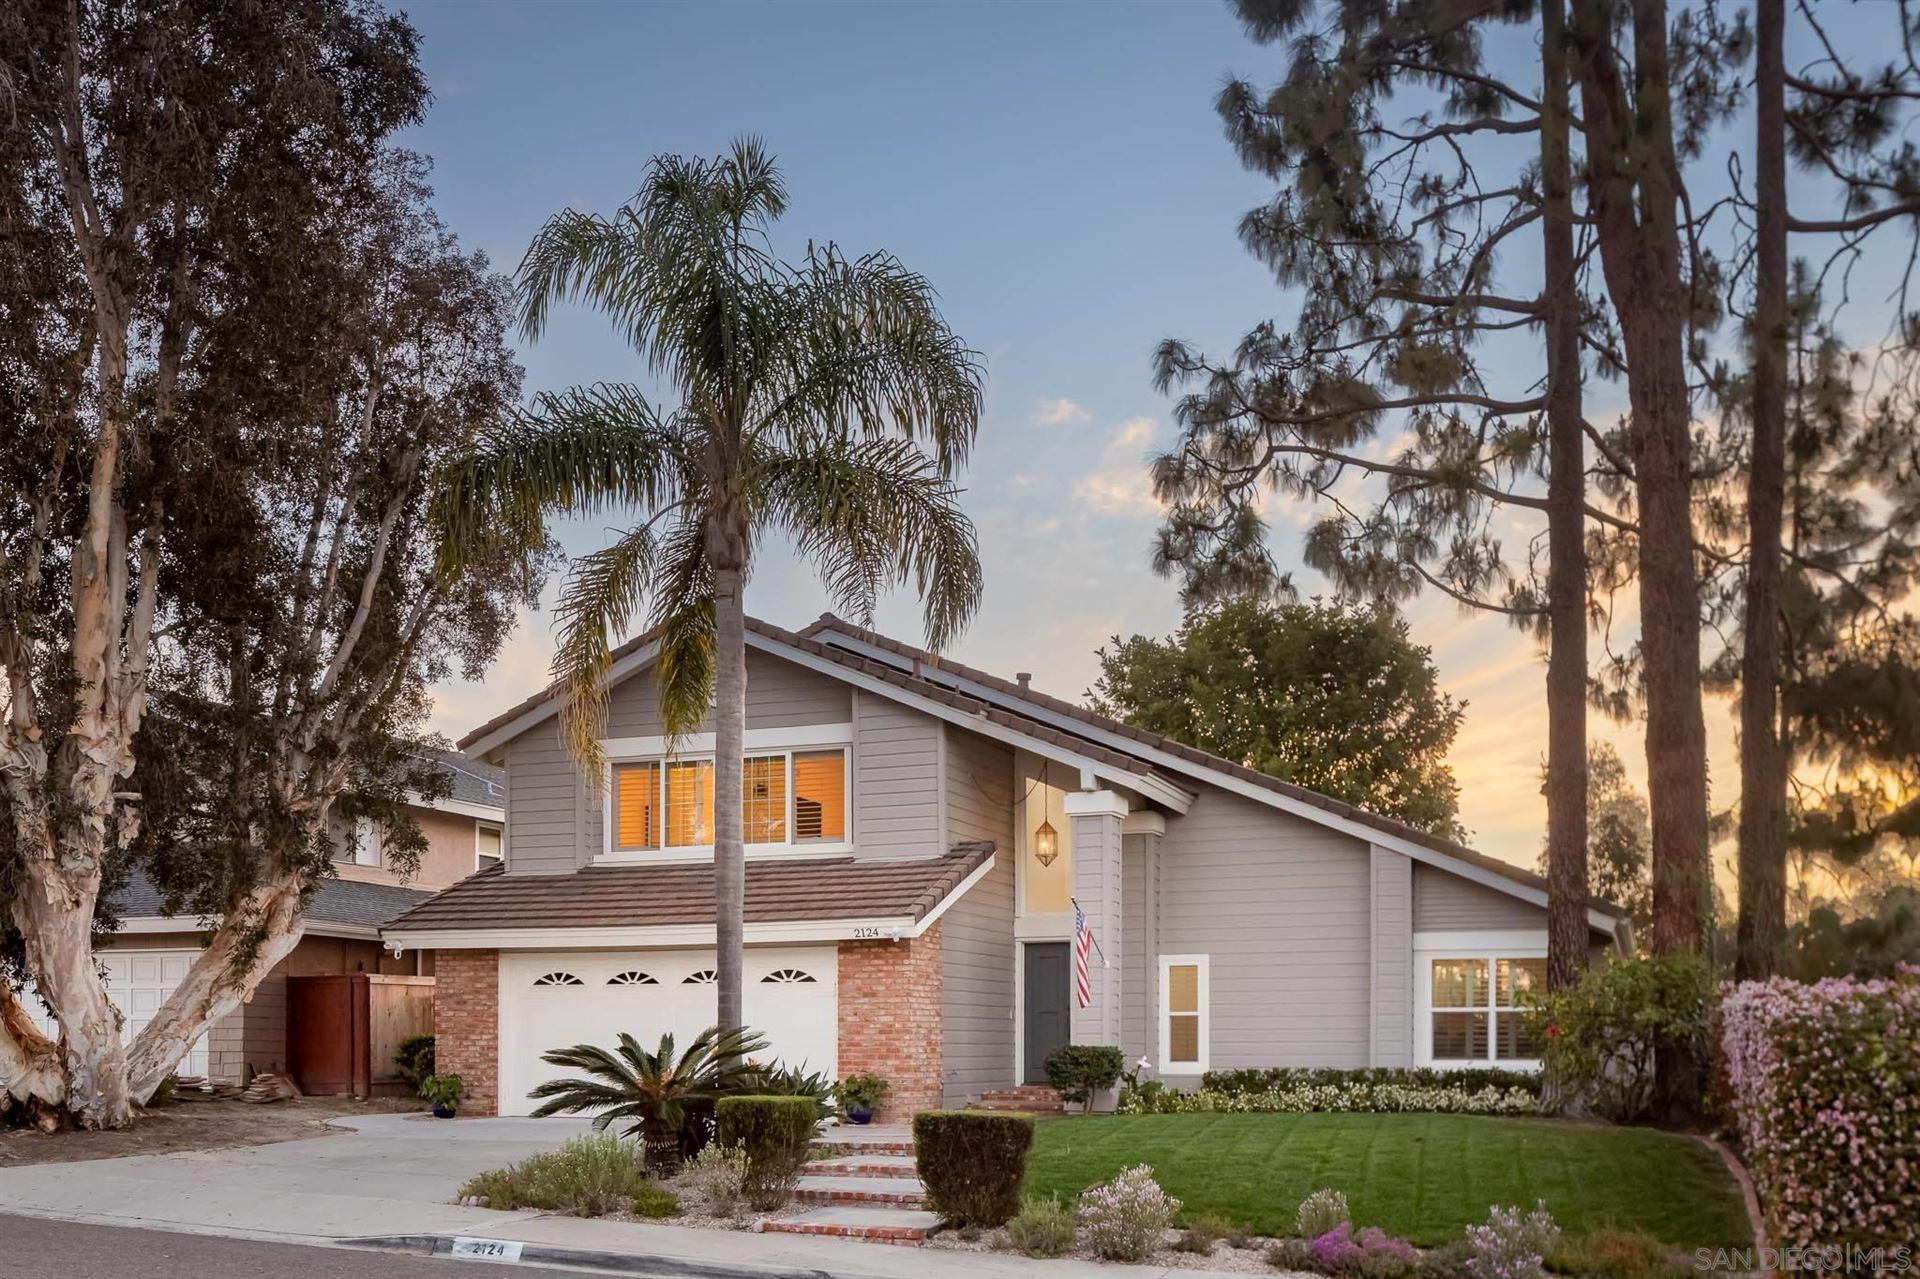 Photo of 2124 Coolngreen Way, Encinitas, CA 92024 (MLS # 210008878)